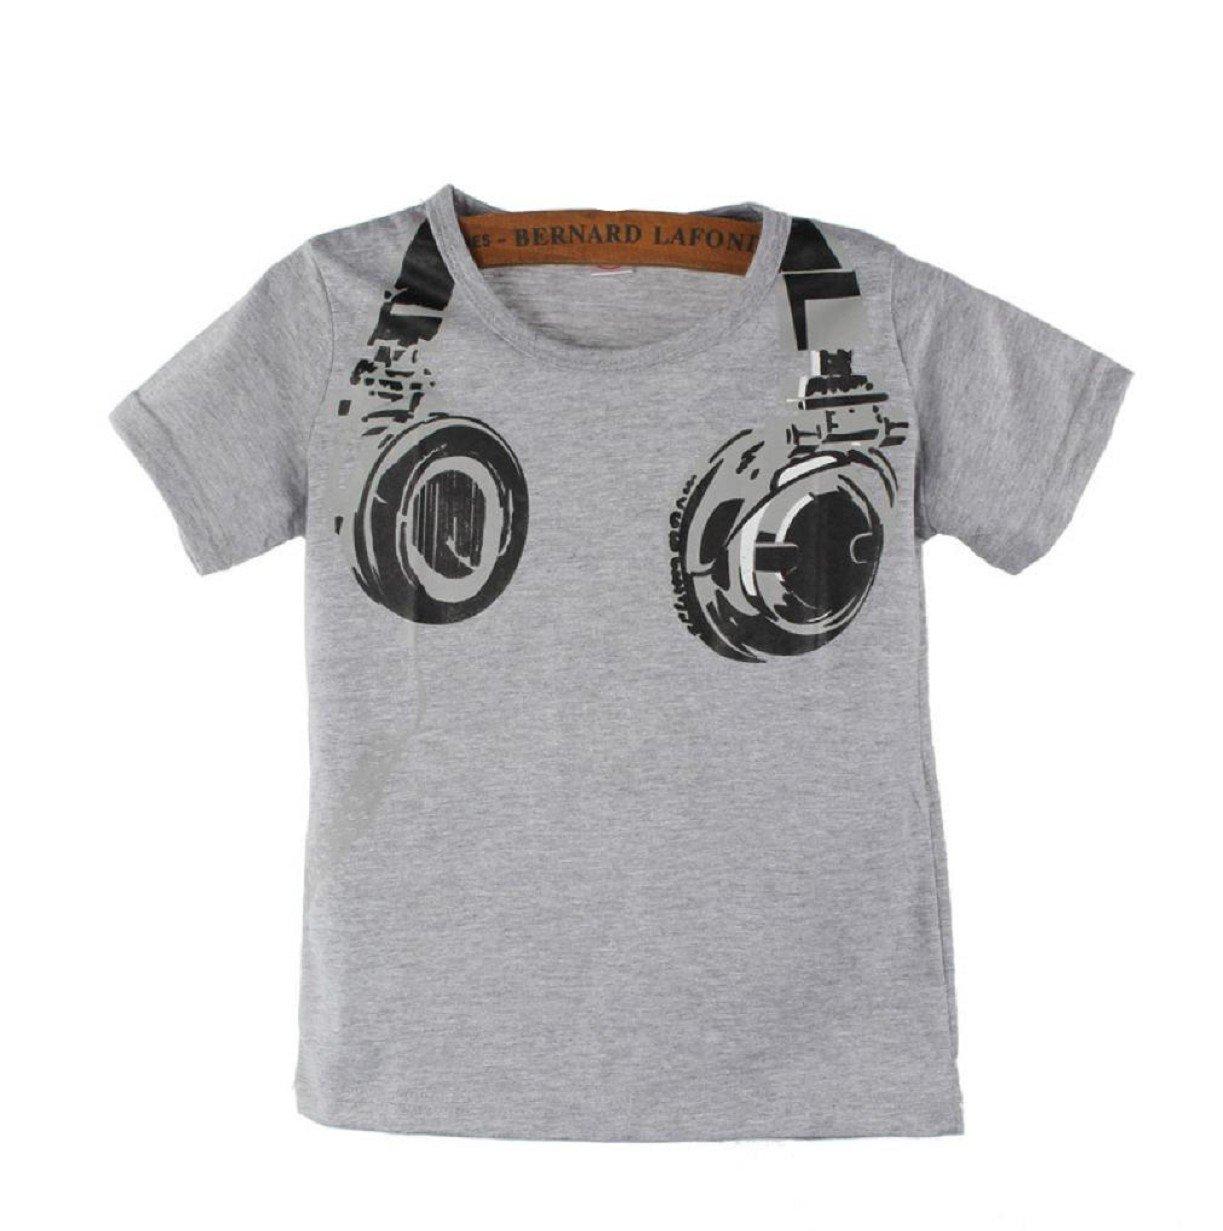 Vovotrade Boy Kids Summer Headphone Short Sleeve Tops Blouses T Shirt Tees Clothes